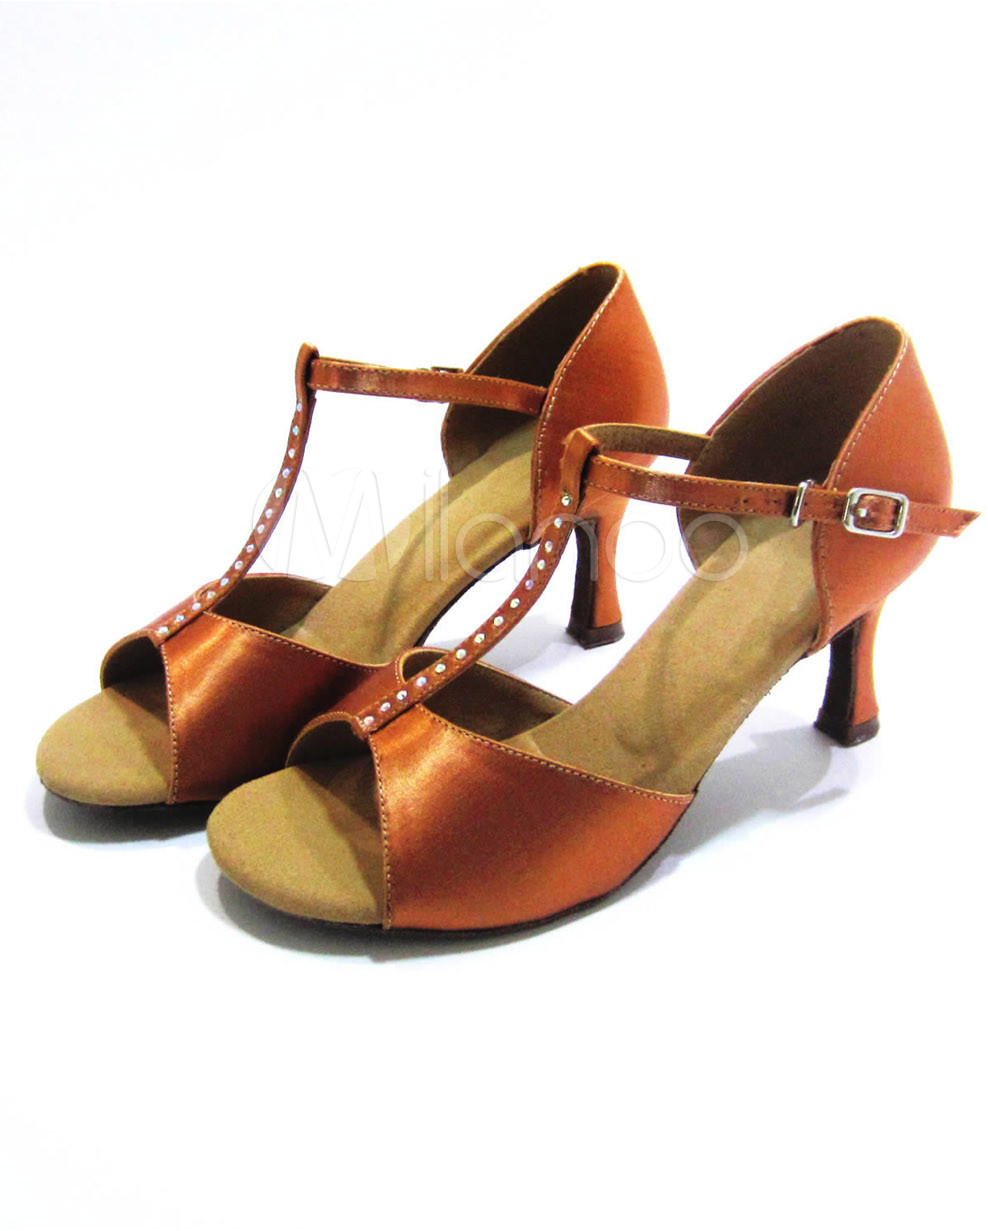 #Milanoo.com Ltd          #Latin Shoes              #Sexy #Bronze #Spool #Heel #Satin #Professional #Customized #Latin #Shoes     Sexy Bronze Spool Heel Satin Professional Customized Latin Shoes                                        http://www.seapai.com/product.aspx?PID=5711265